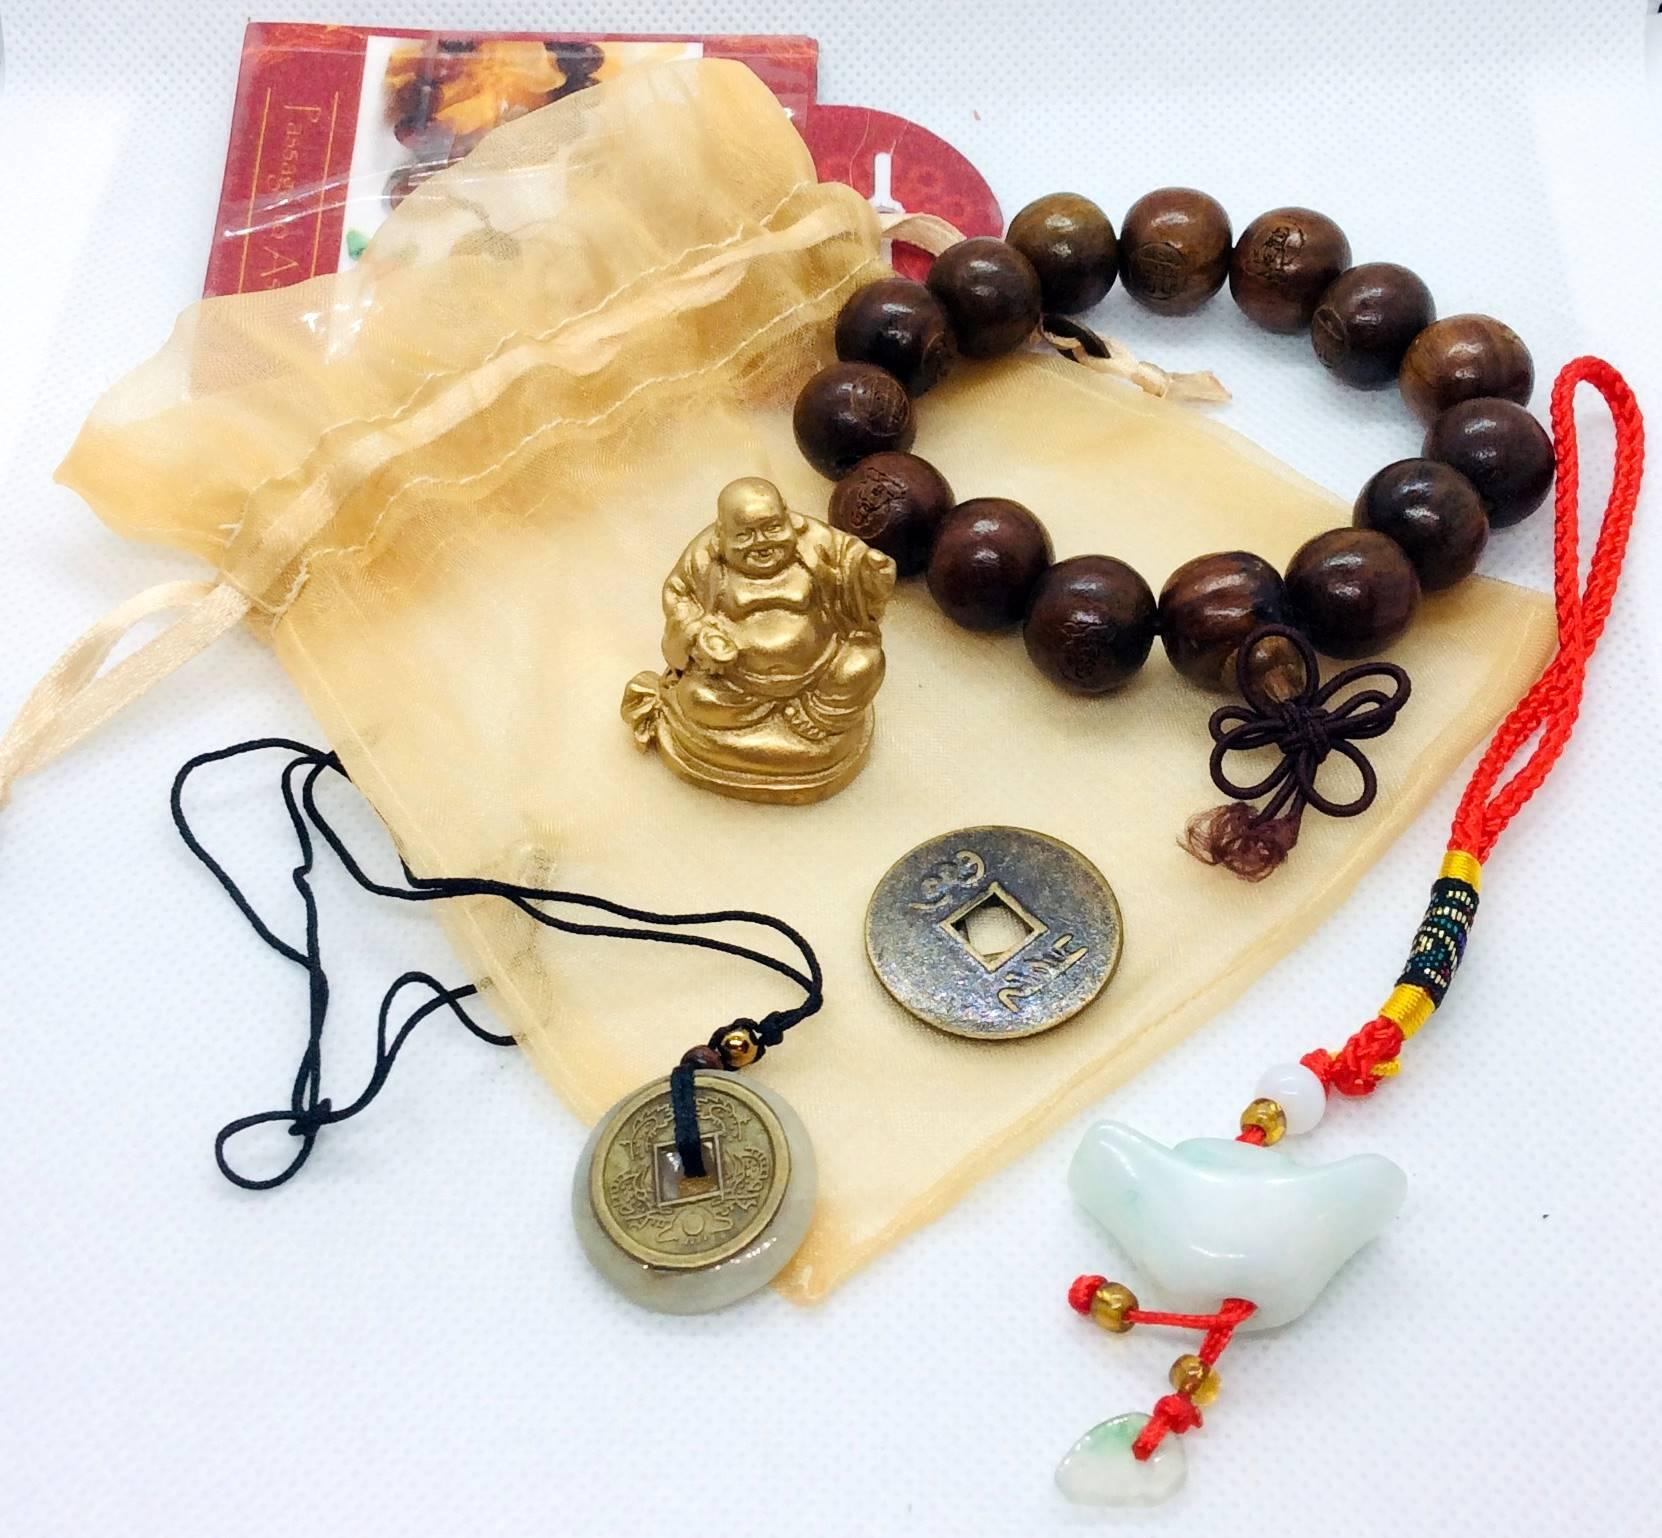 Feng shui Mini Gift at MVC